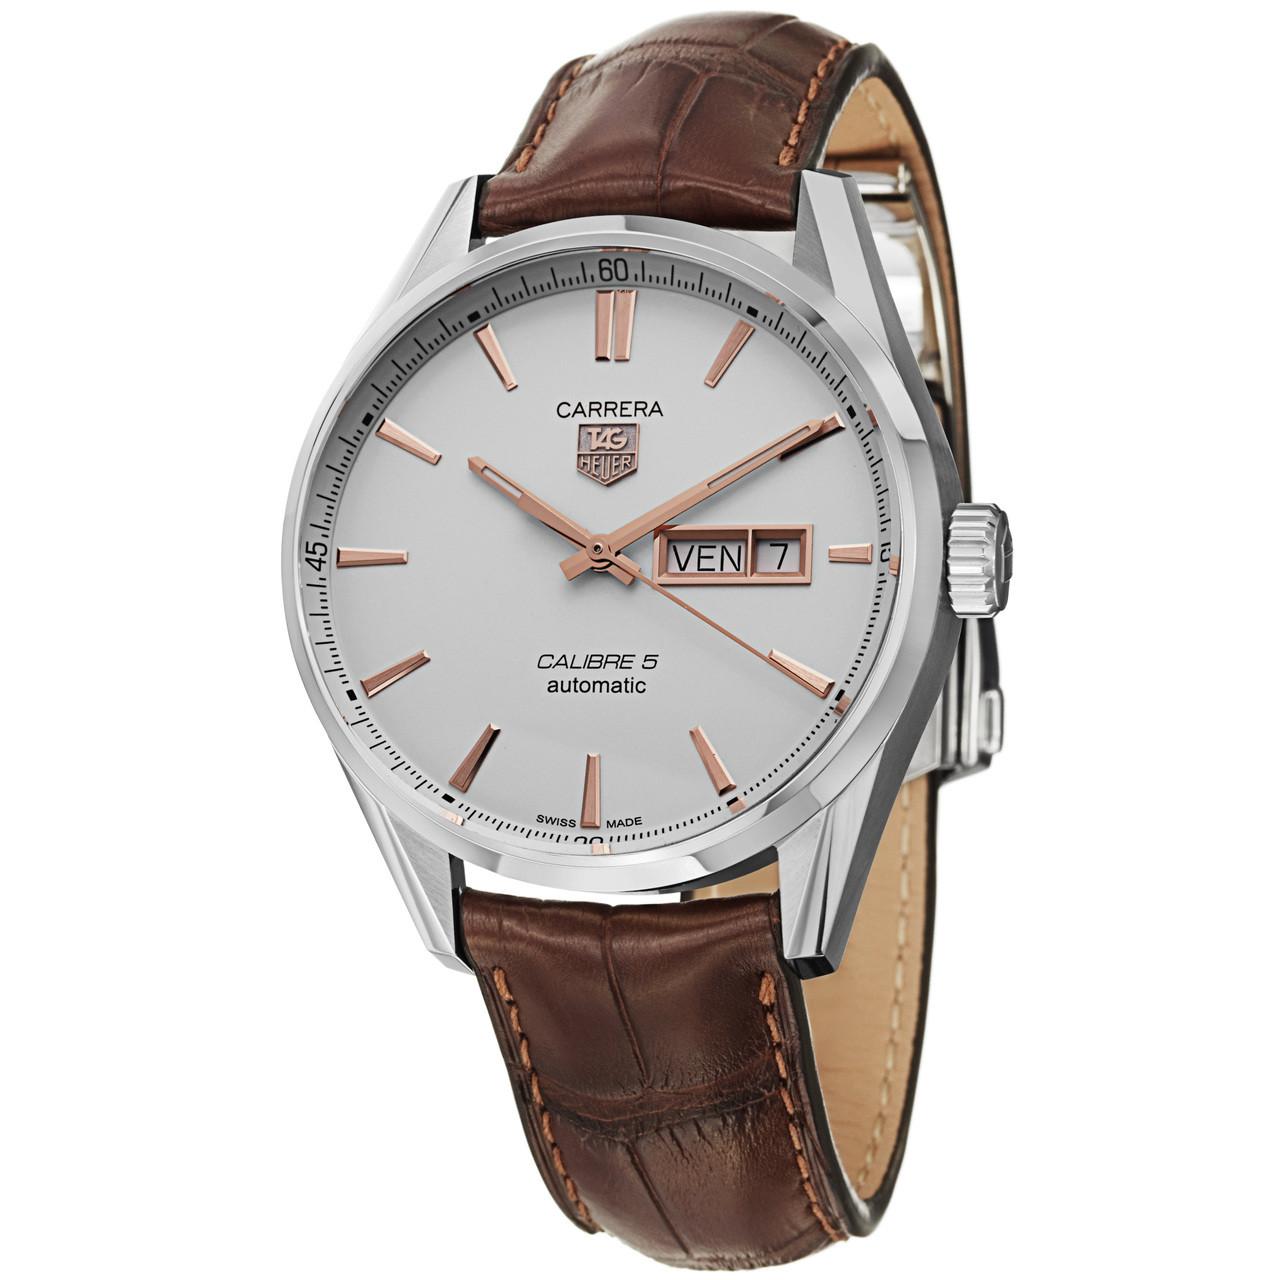 online retailer 5c243 e86ae Tag Heuer Men's WAR201D.FC6291 Carrera Silver Dial Day Date Watch